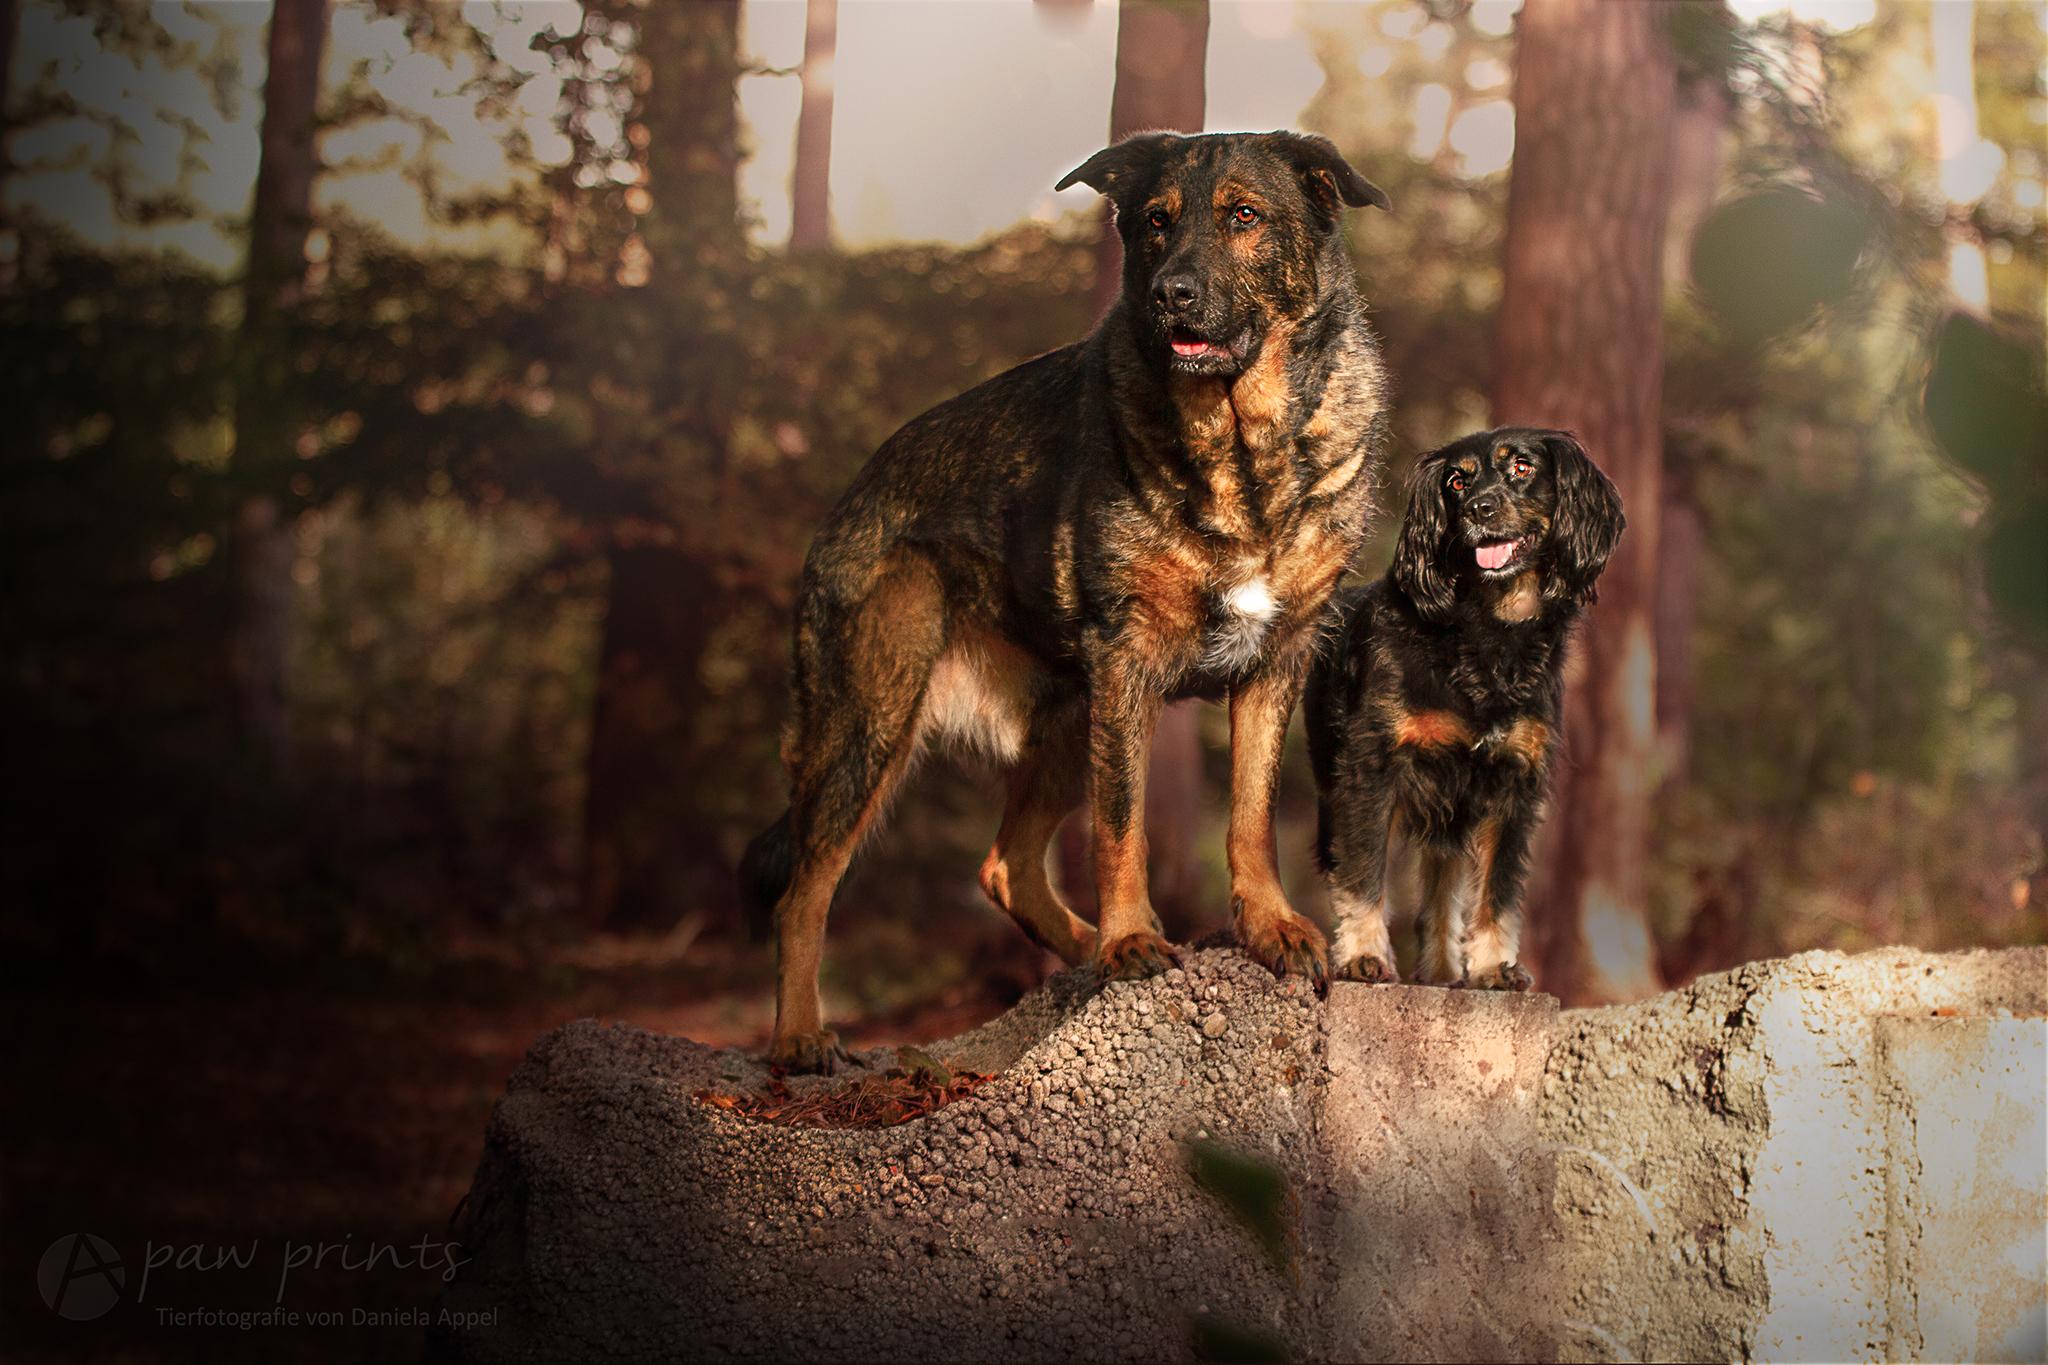 Inuki und Skadi | kleinstadthunde.de